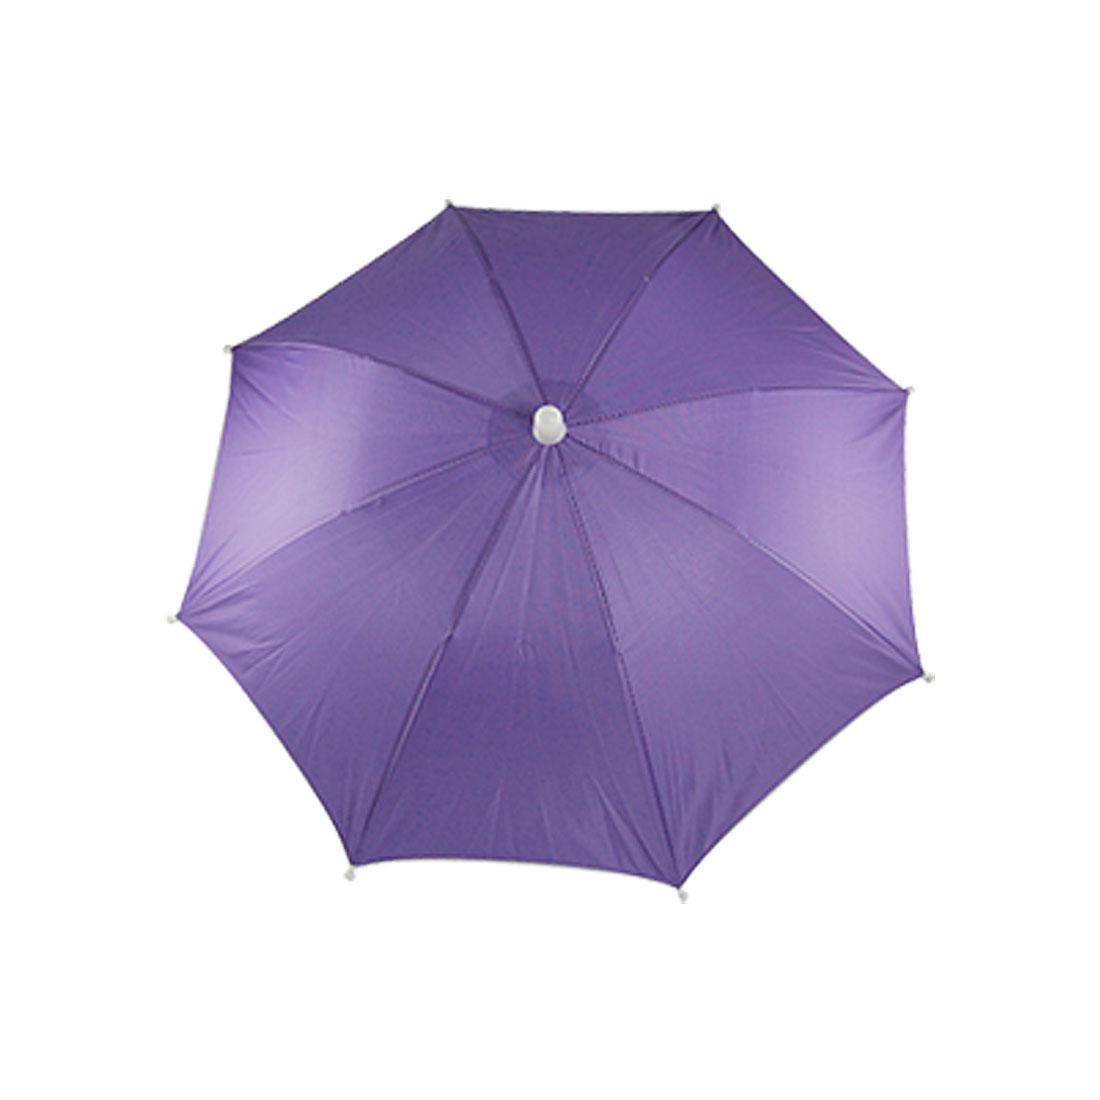 Outdoor Sports Fishing Purple Sun Rain Shade Umbrella Hat